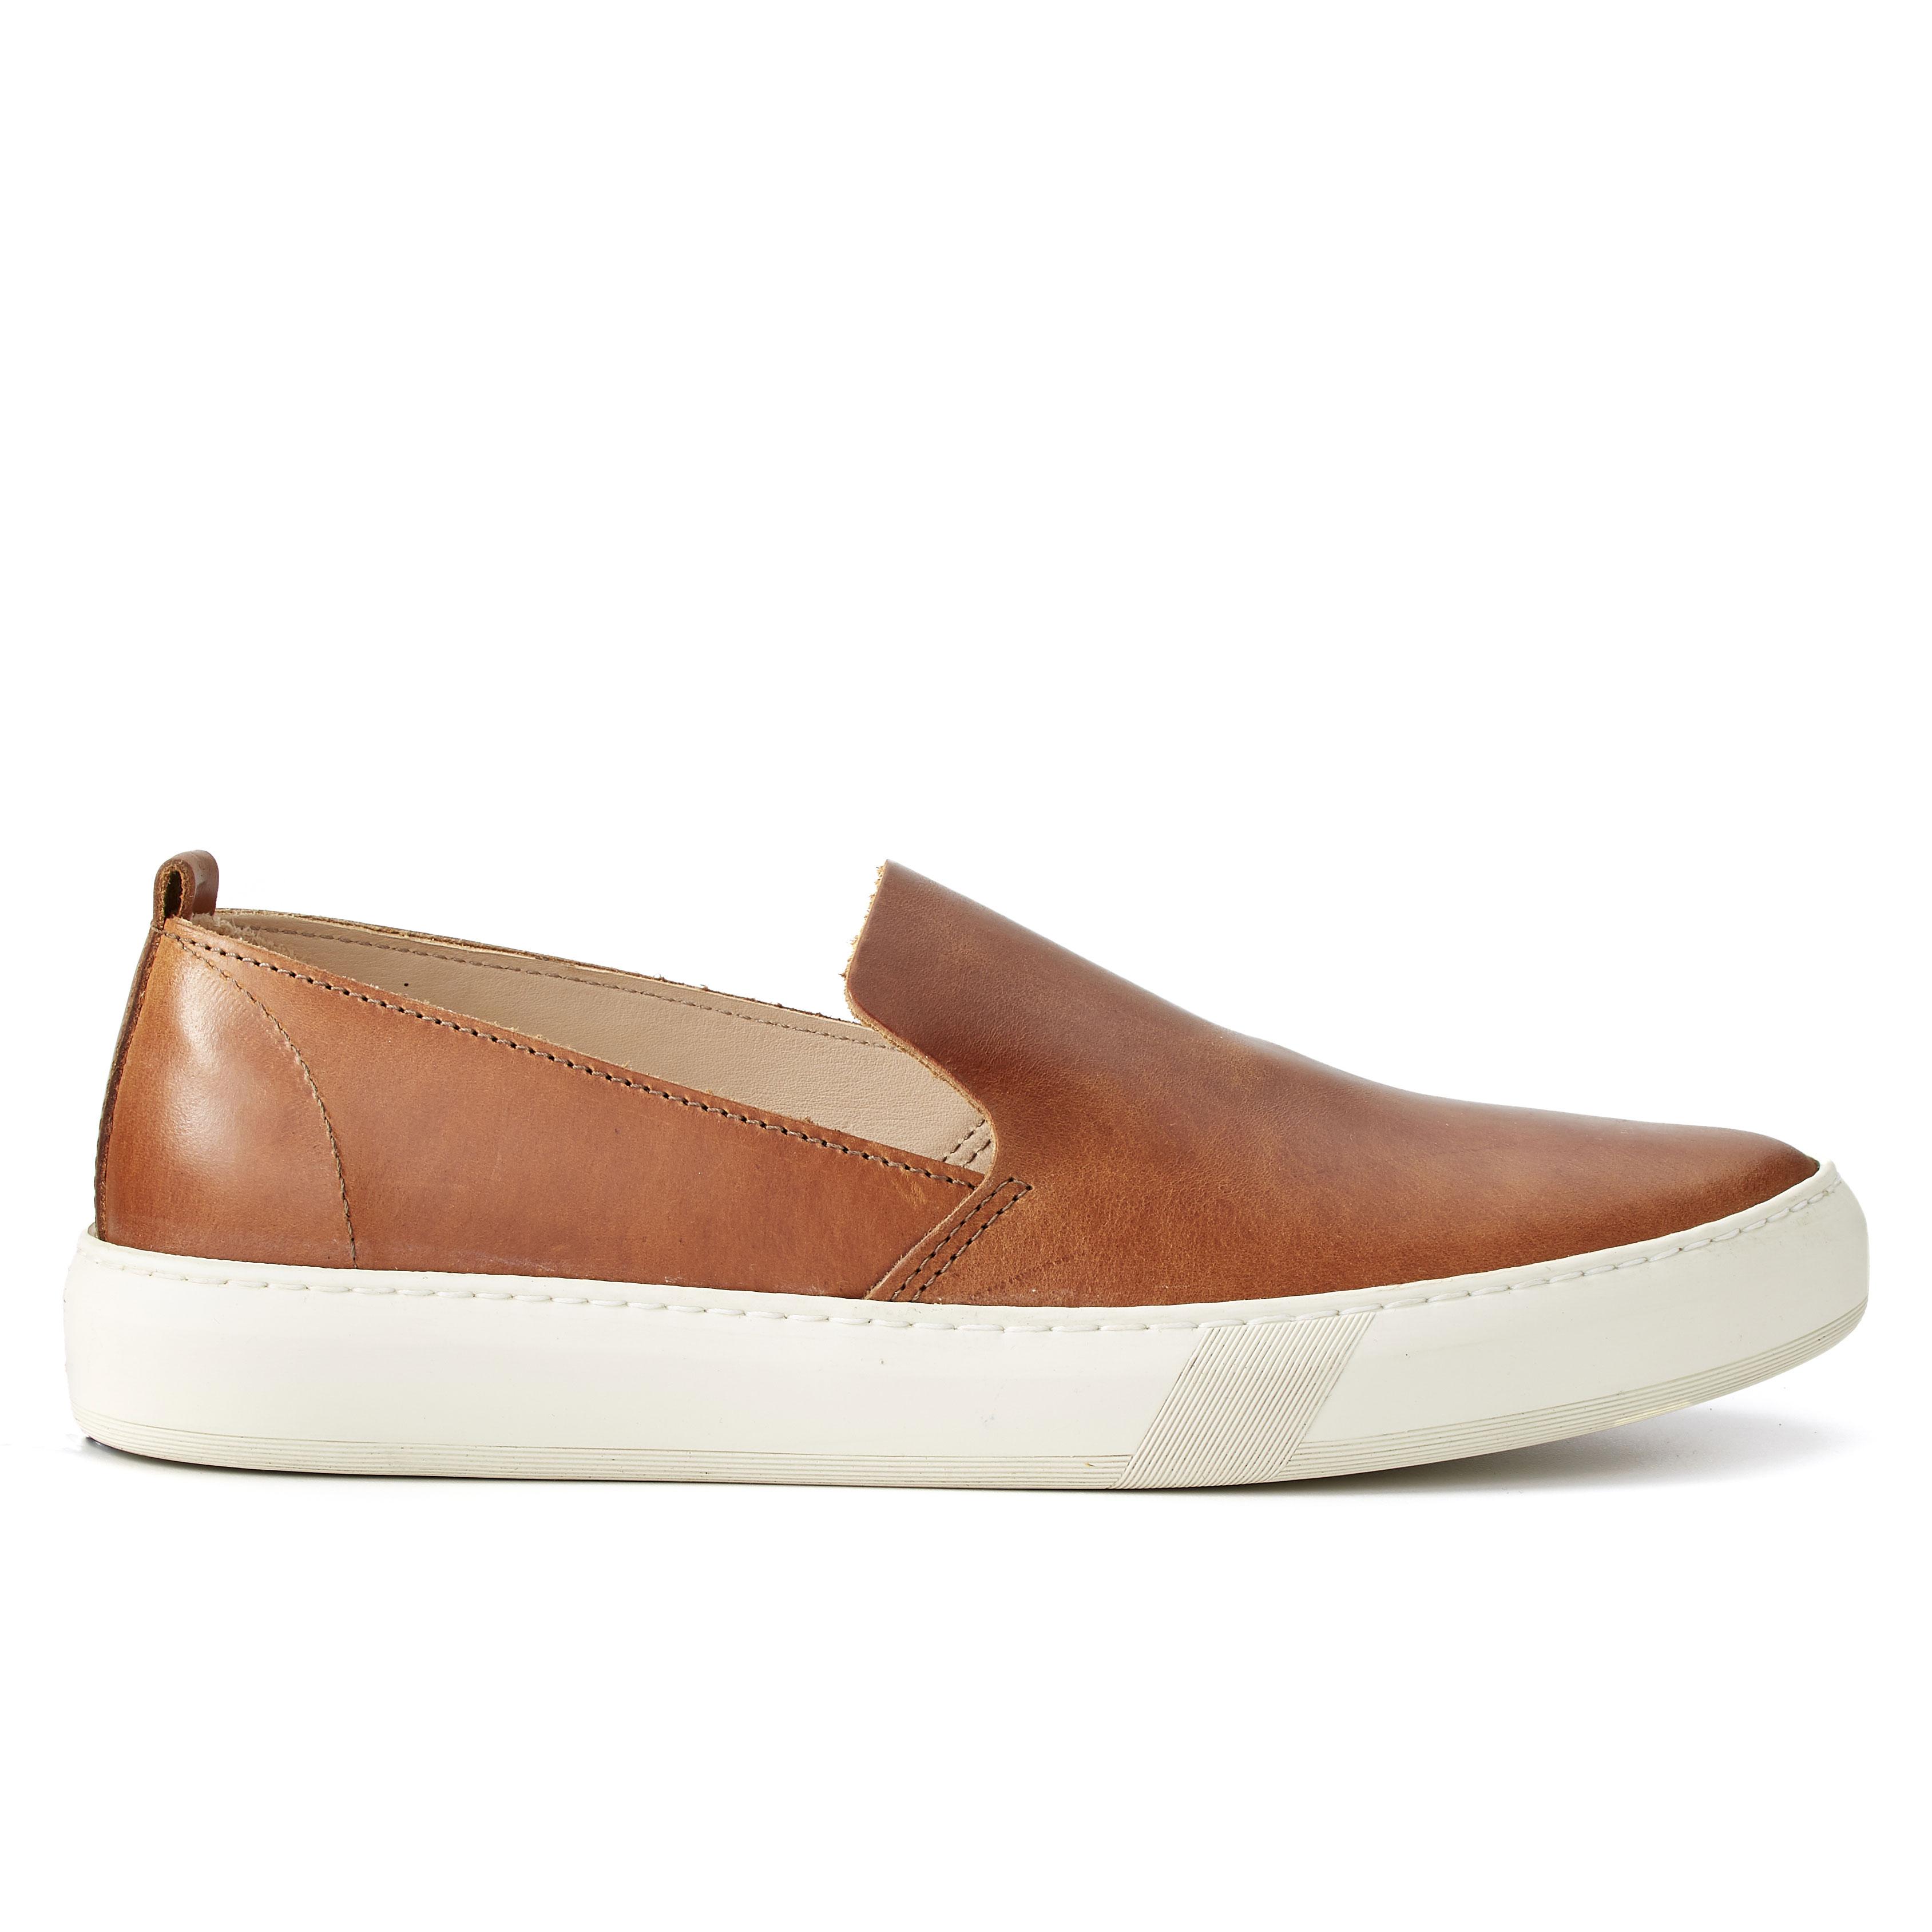 slip on shoes summer